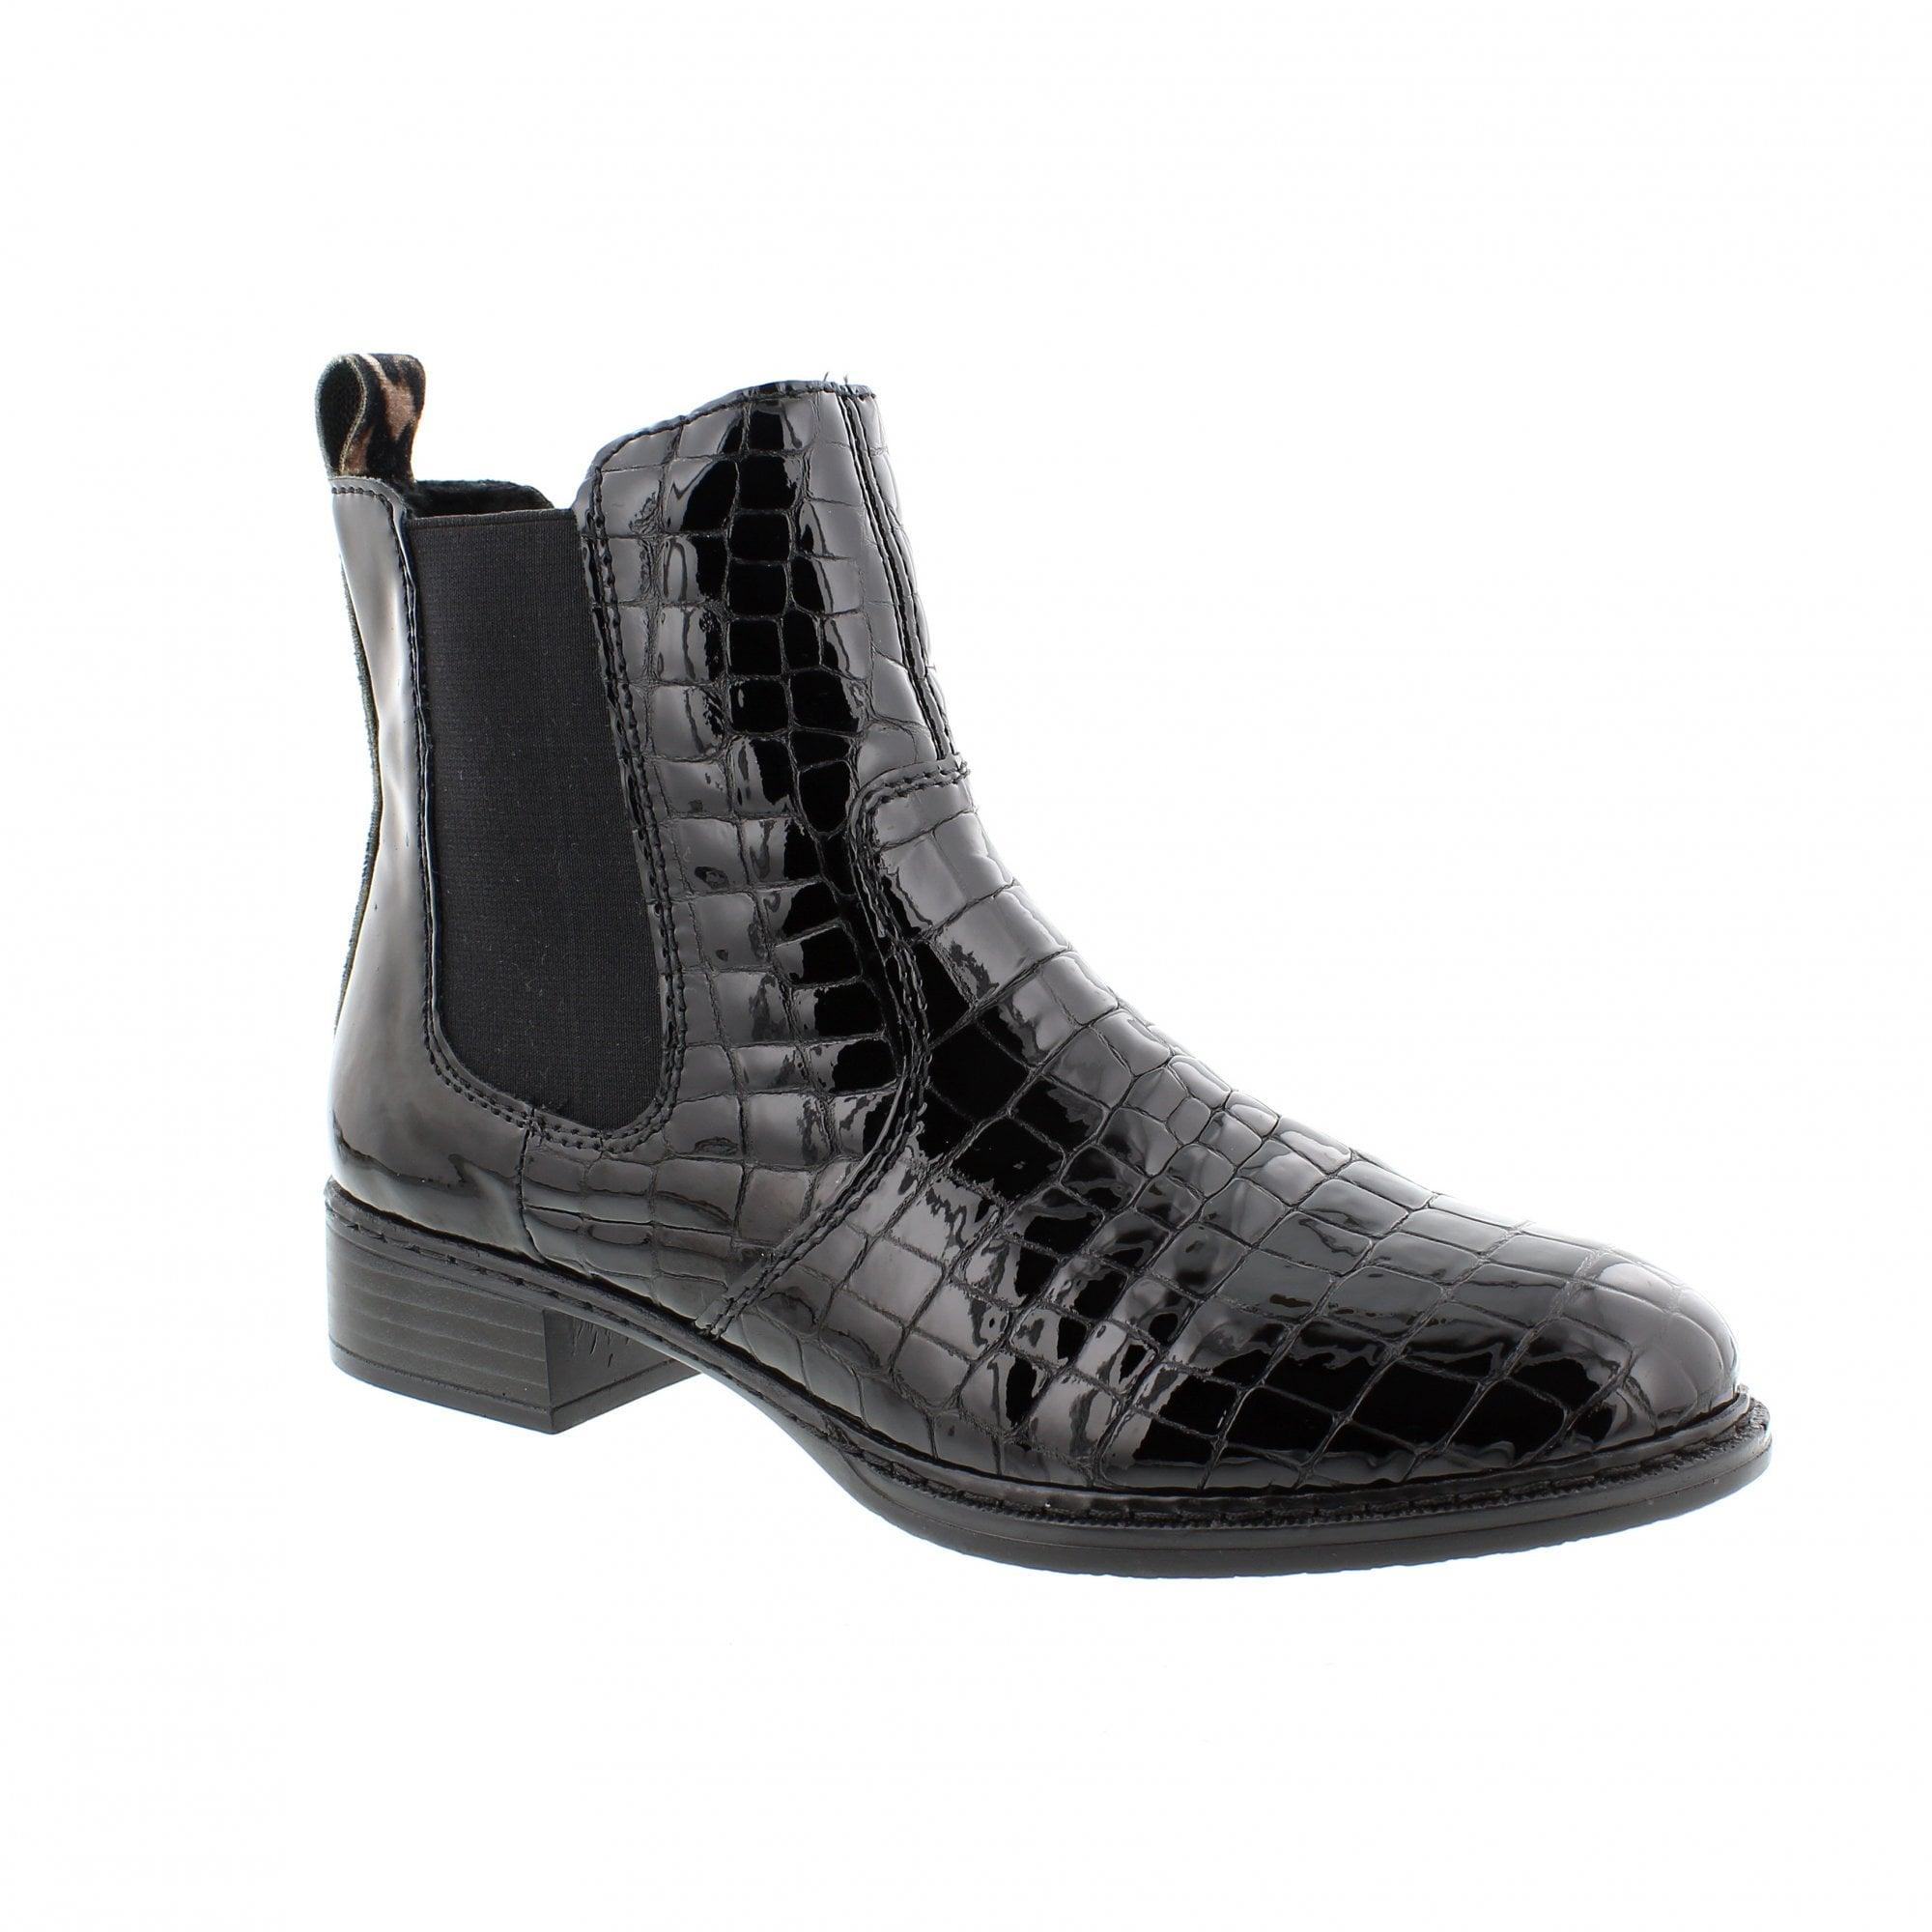 Rieker 73494-00 Patent Croc/Leopard